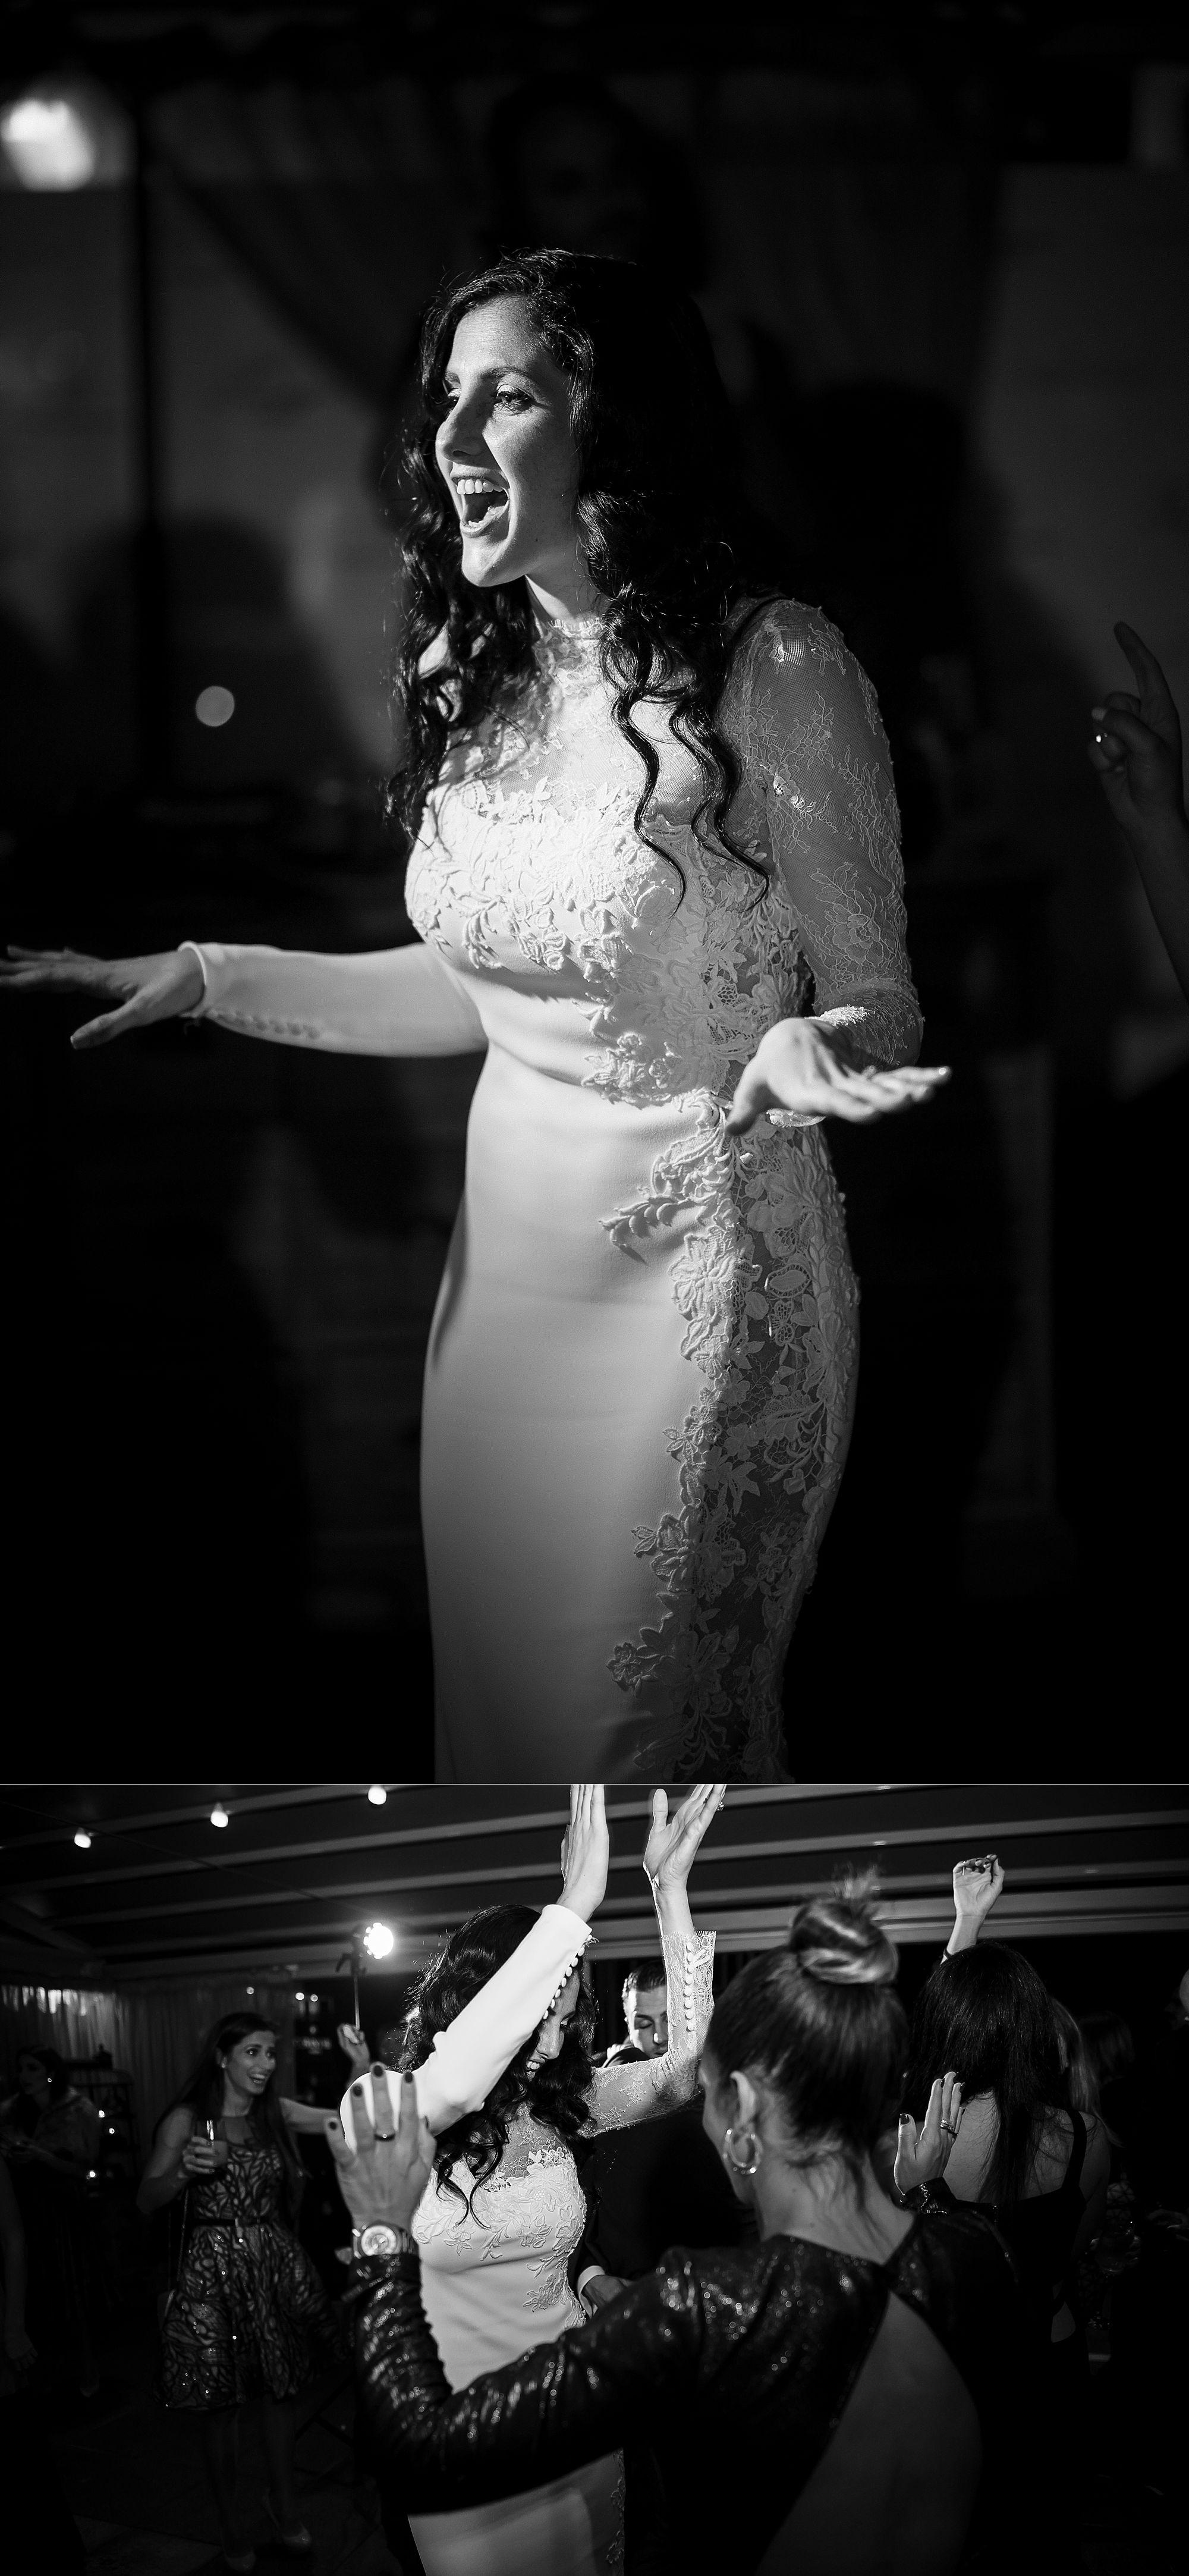 Kristina & Ben Camille - Buddhamann Corinthia - Wedding Photography Malta - Shane P. Watts